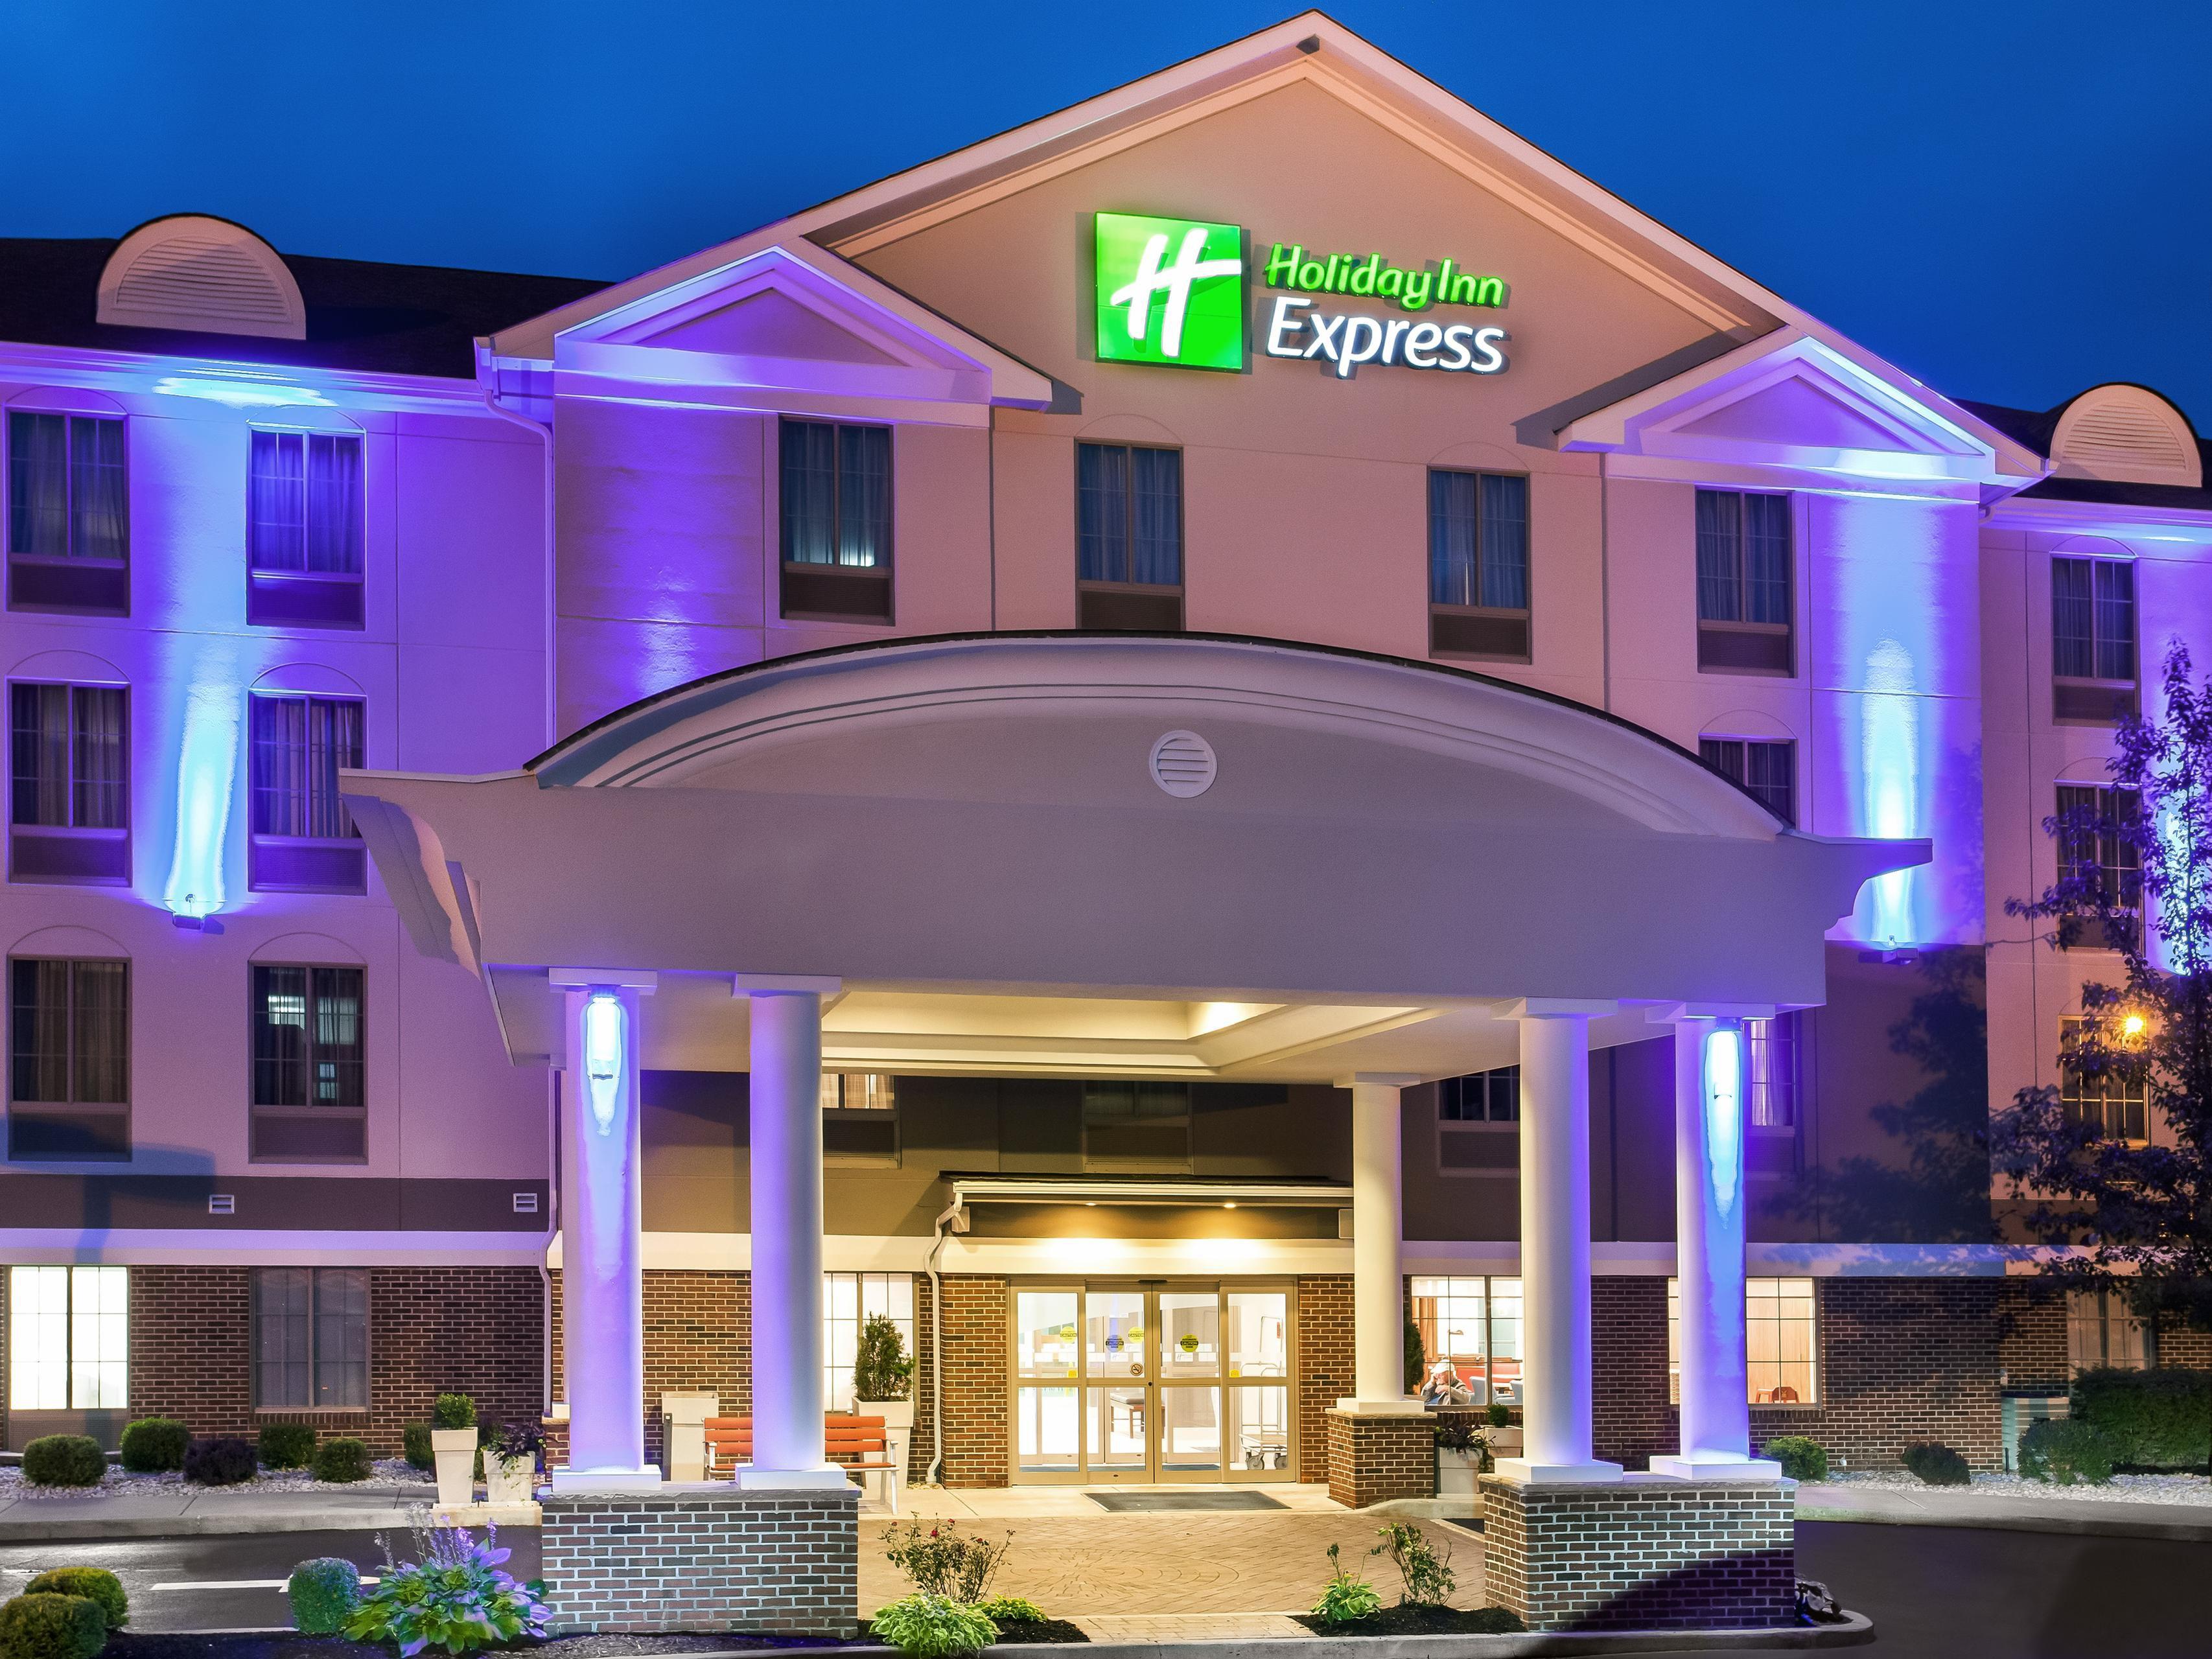 Holiday Inn Express Mount Arlington Hotels | Budget Hotels